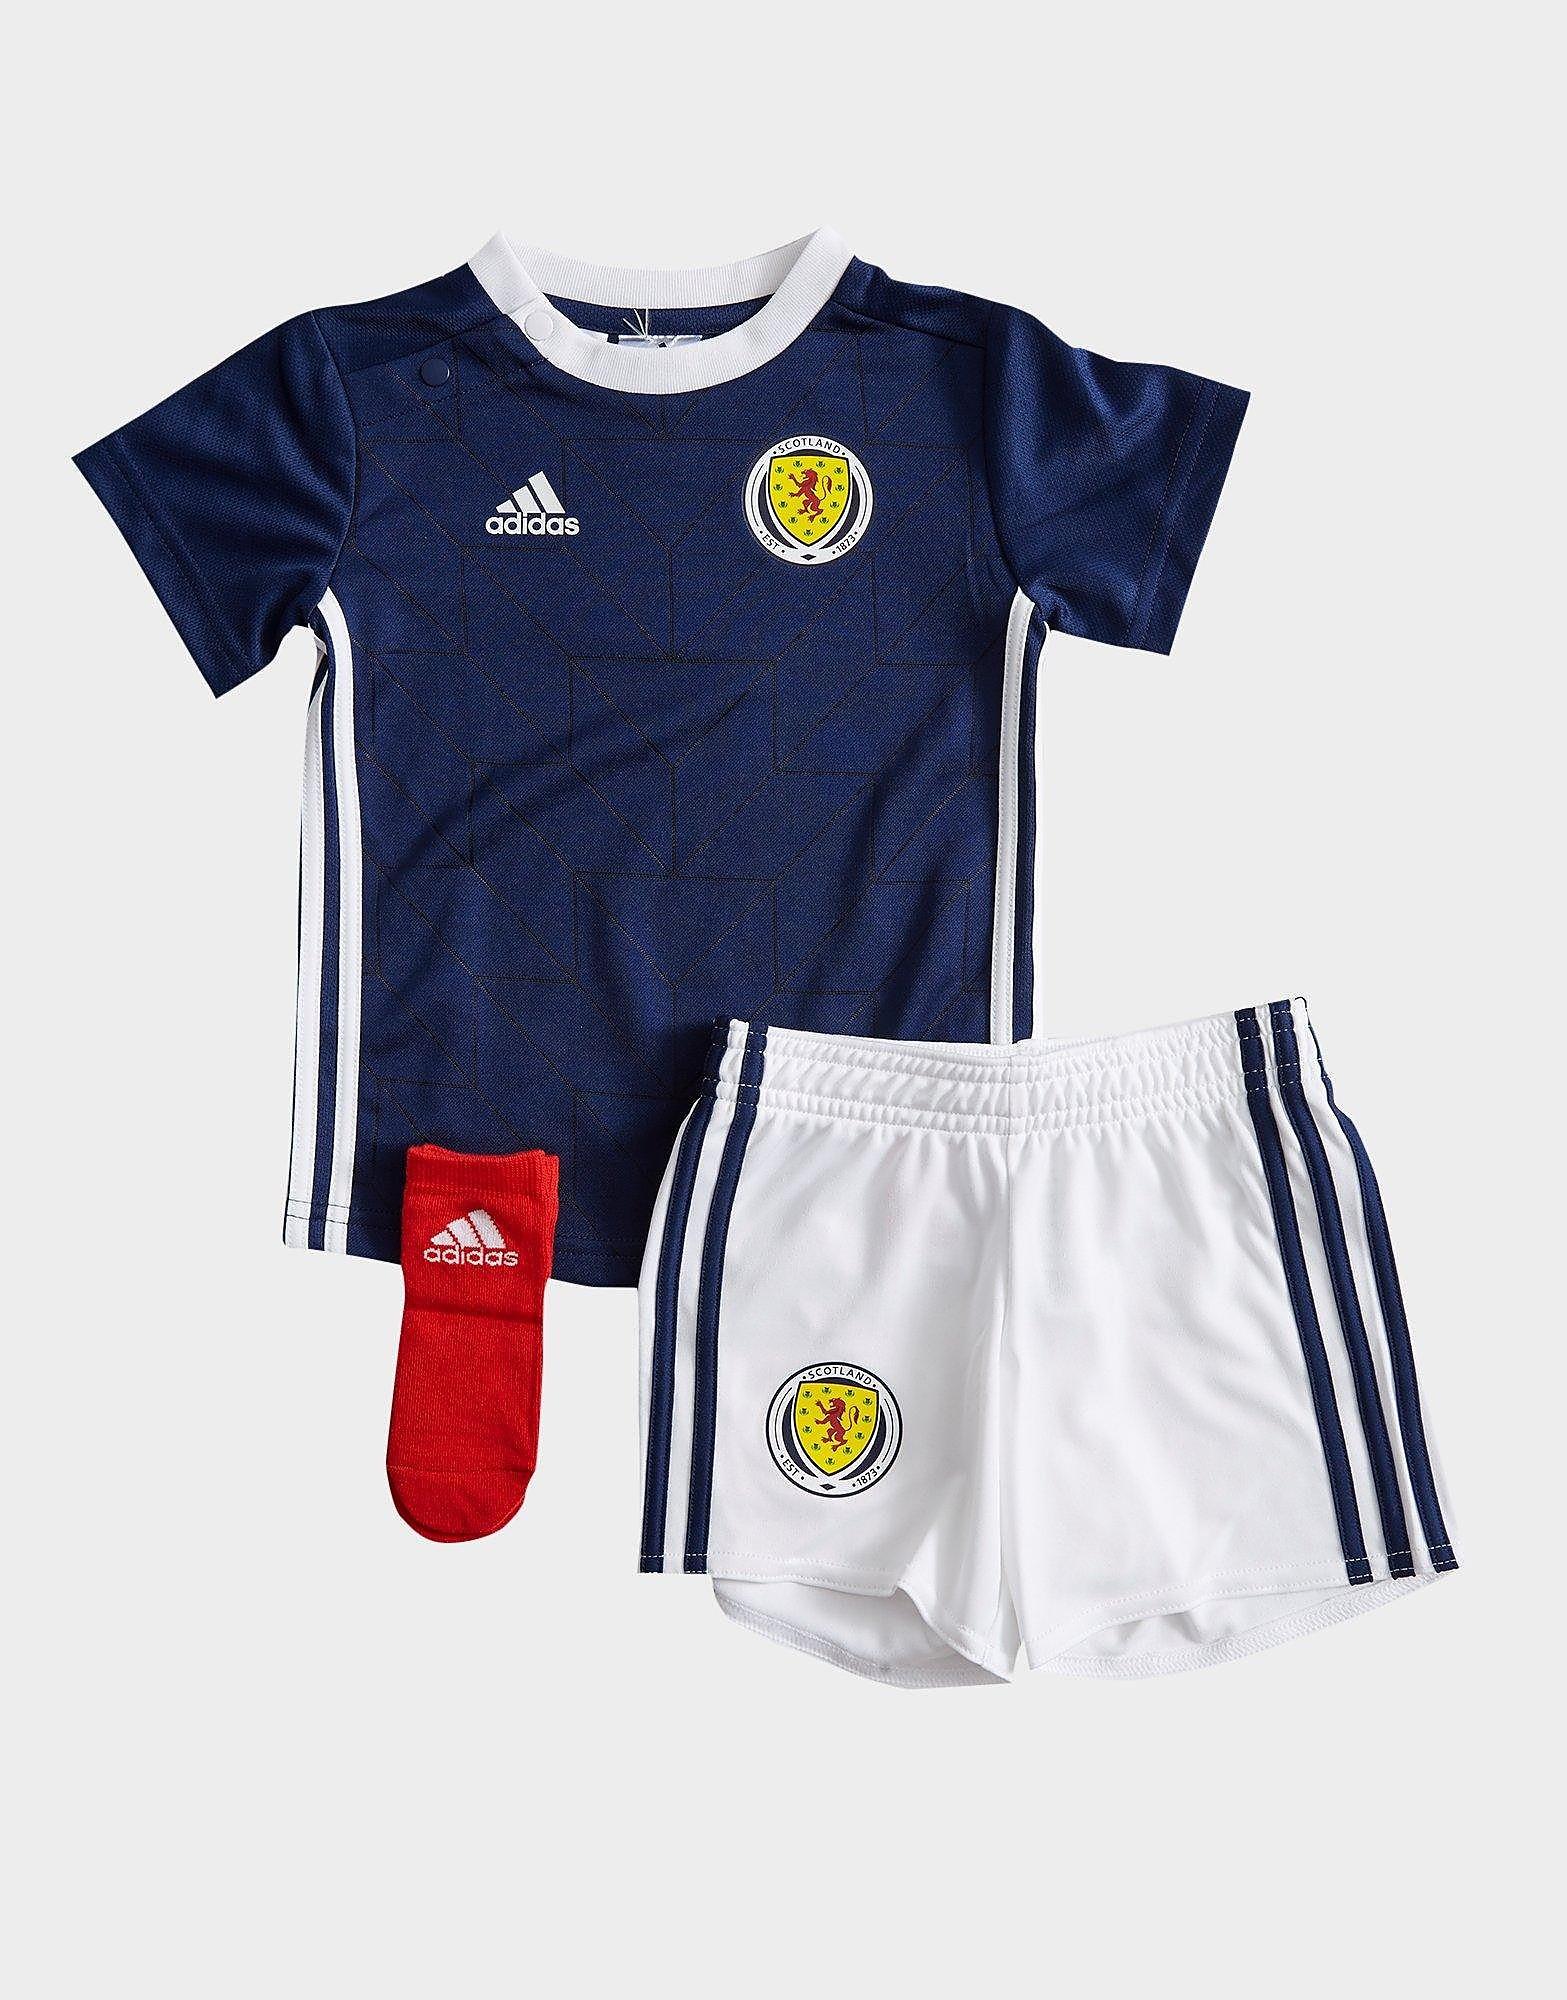 adidas Scotland 2018/19 Home Kit Baby's - Blauw - Kind